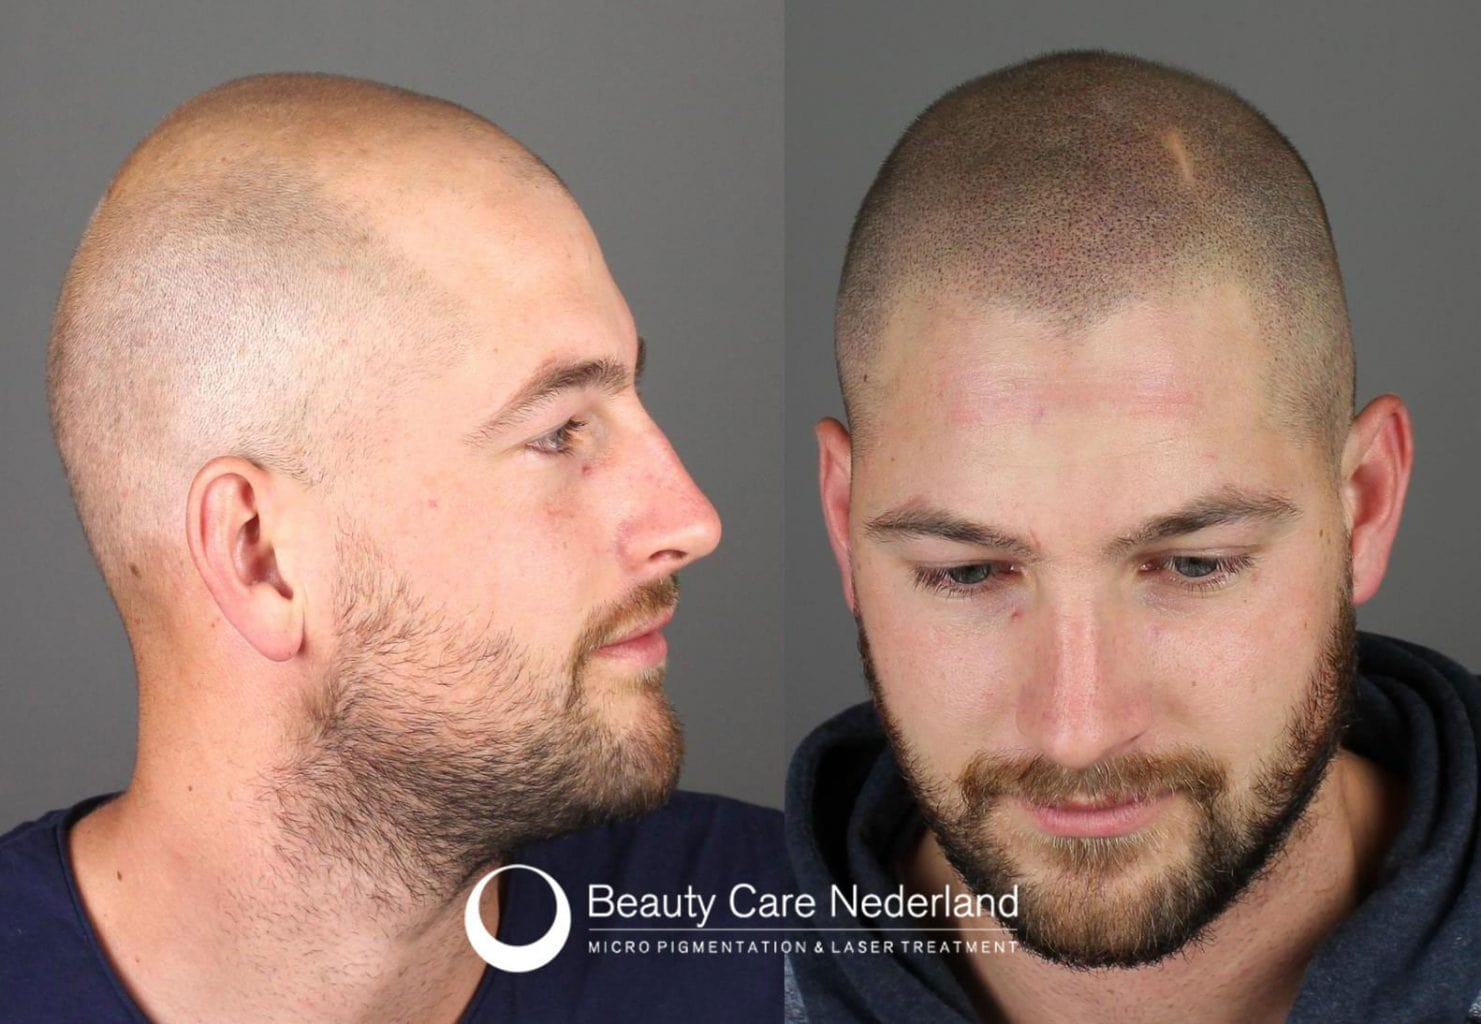 Scalp Micropigmentation Beauty Care Nederland The Netherlands